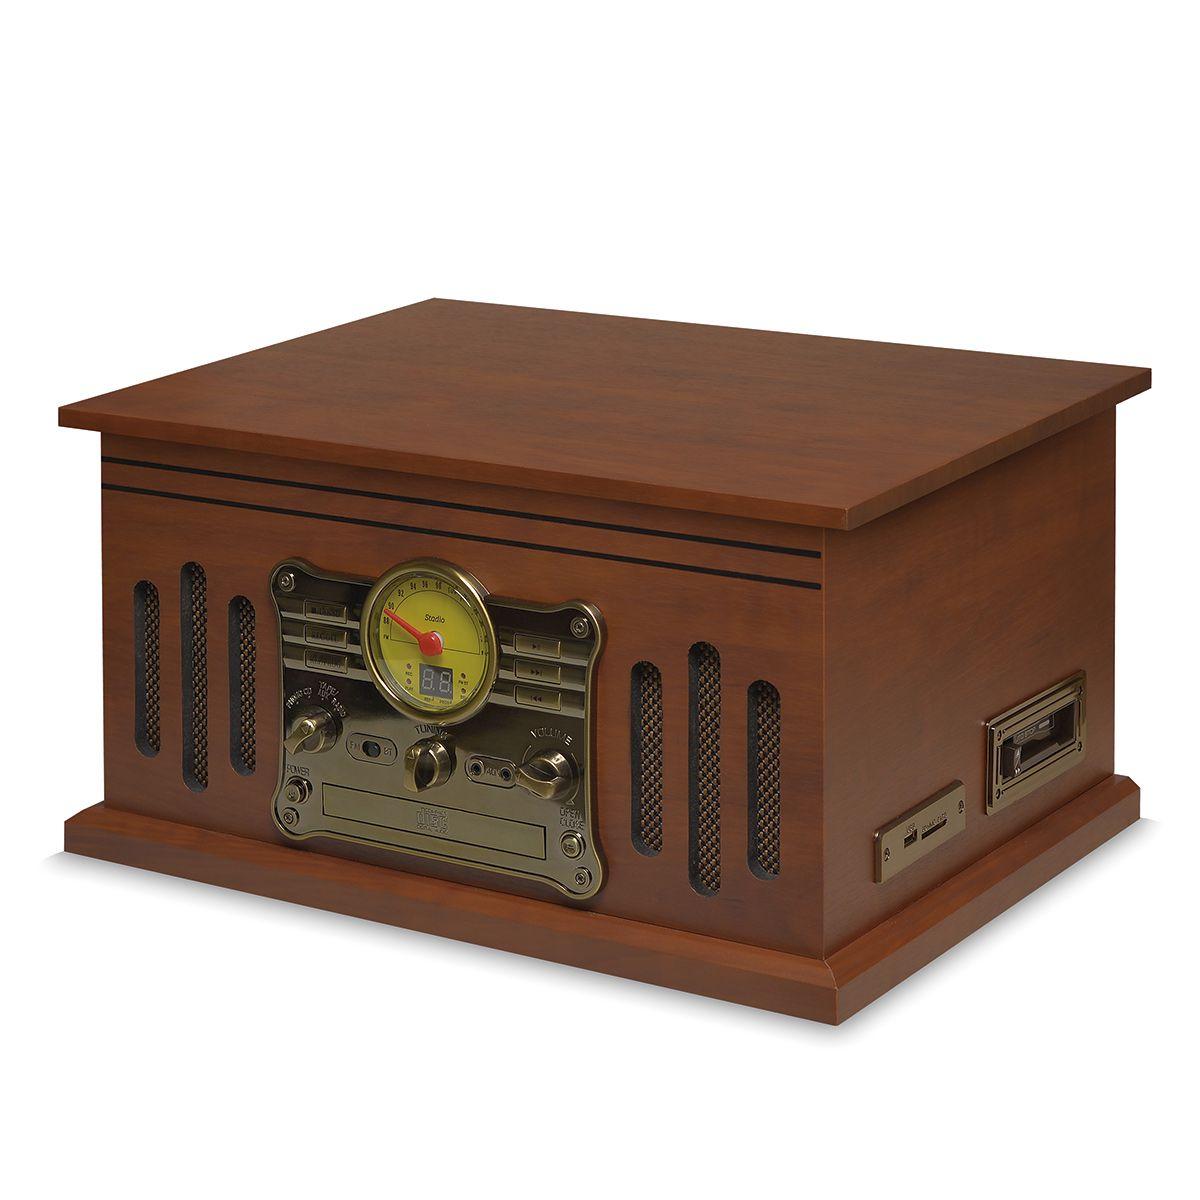 Vitrola Retrô Raveo Stadio Toca Discos, Fita K7, USB, CD, FM, Bluetooth